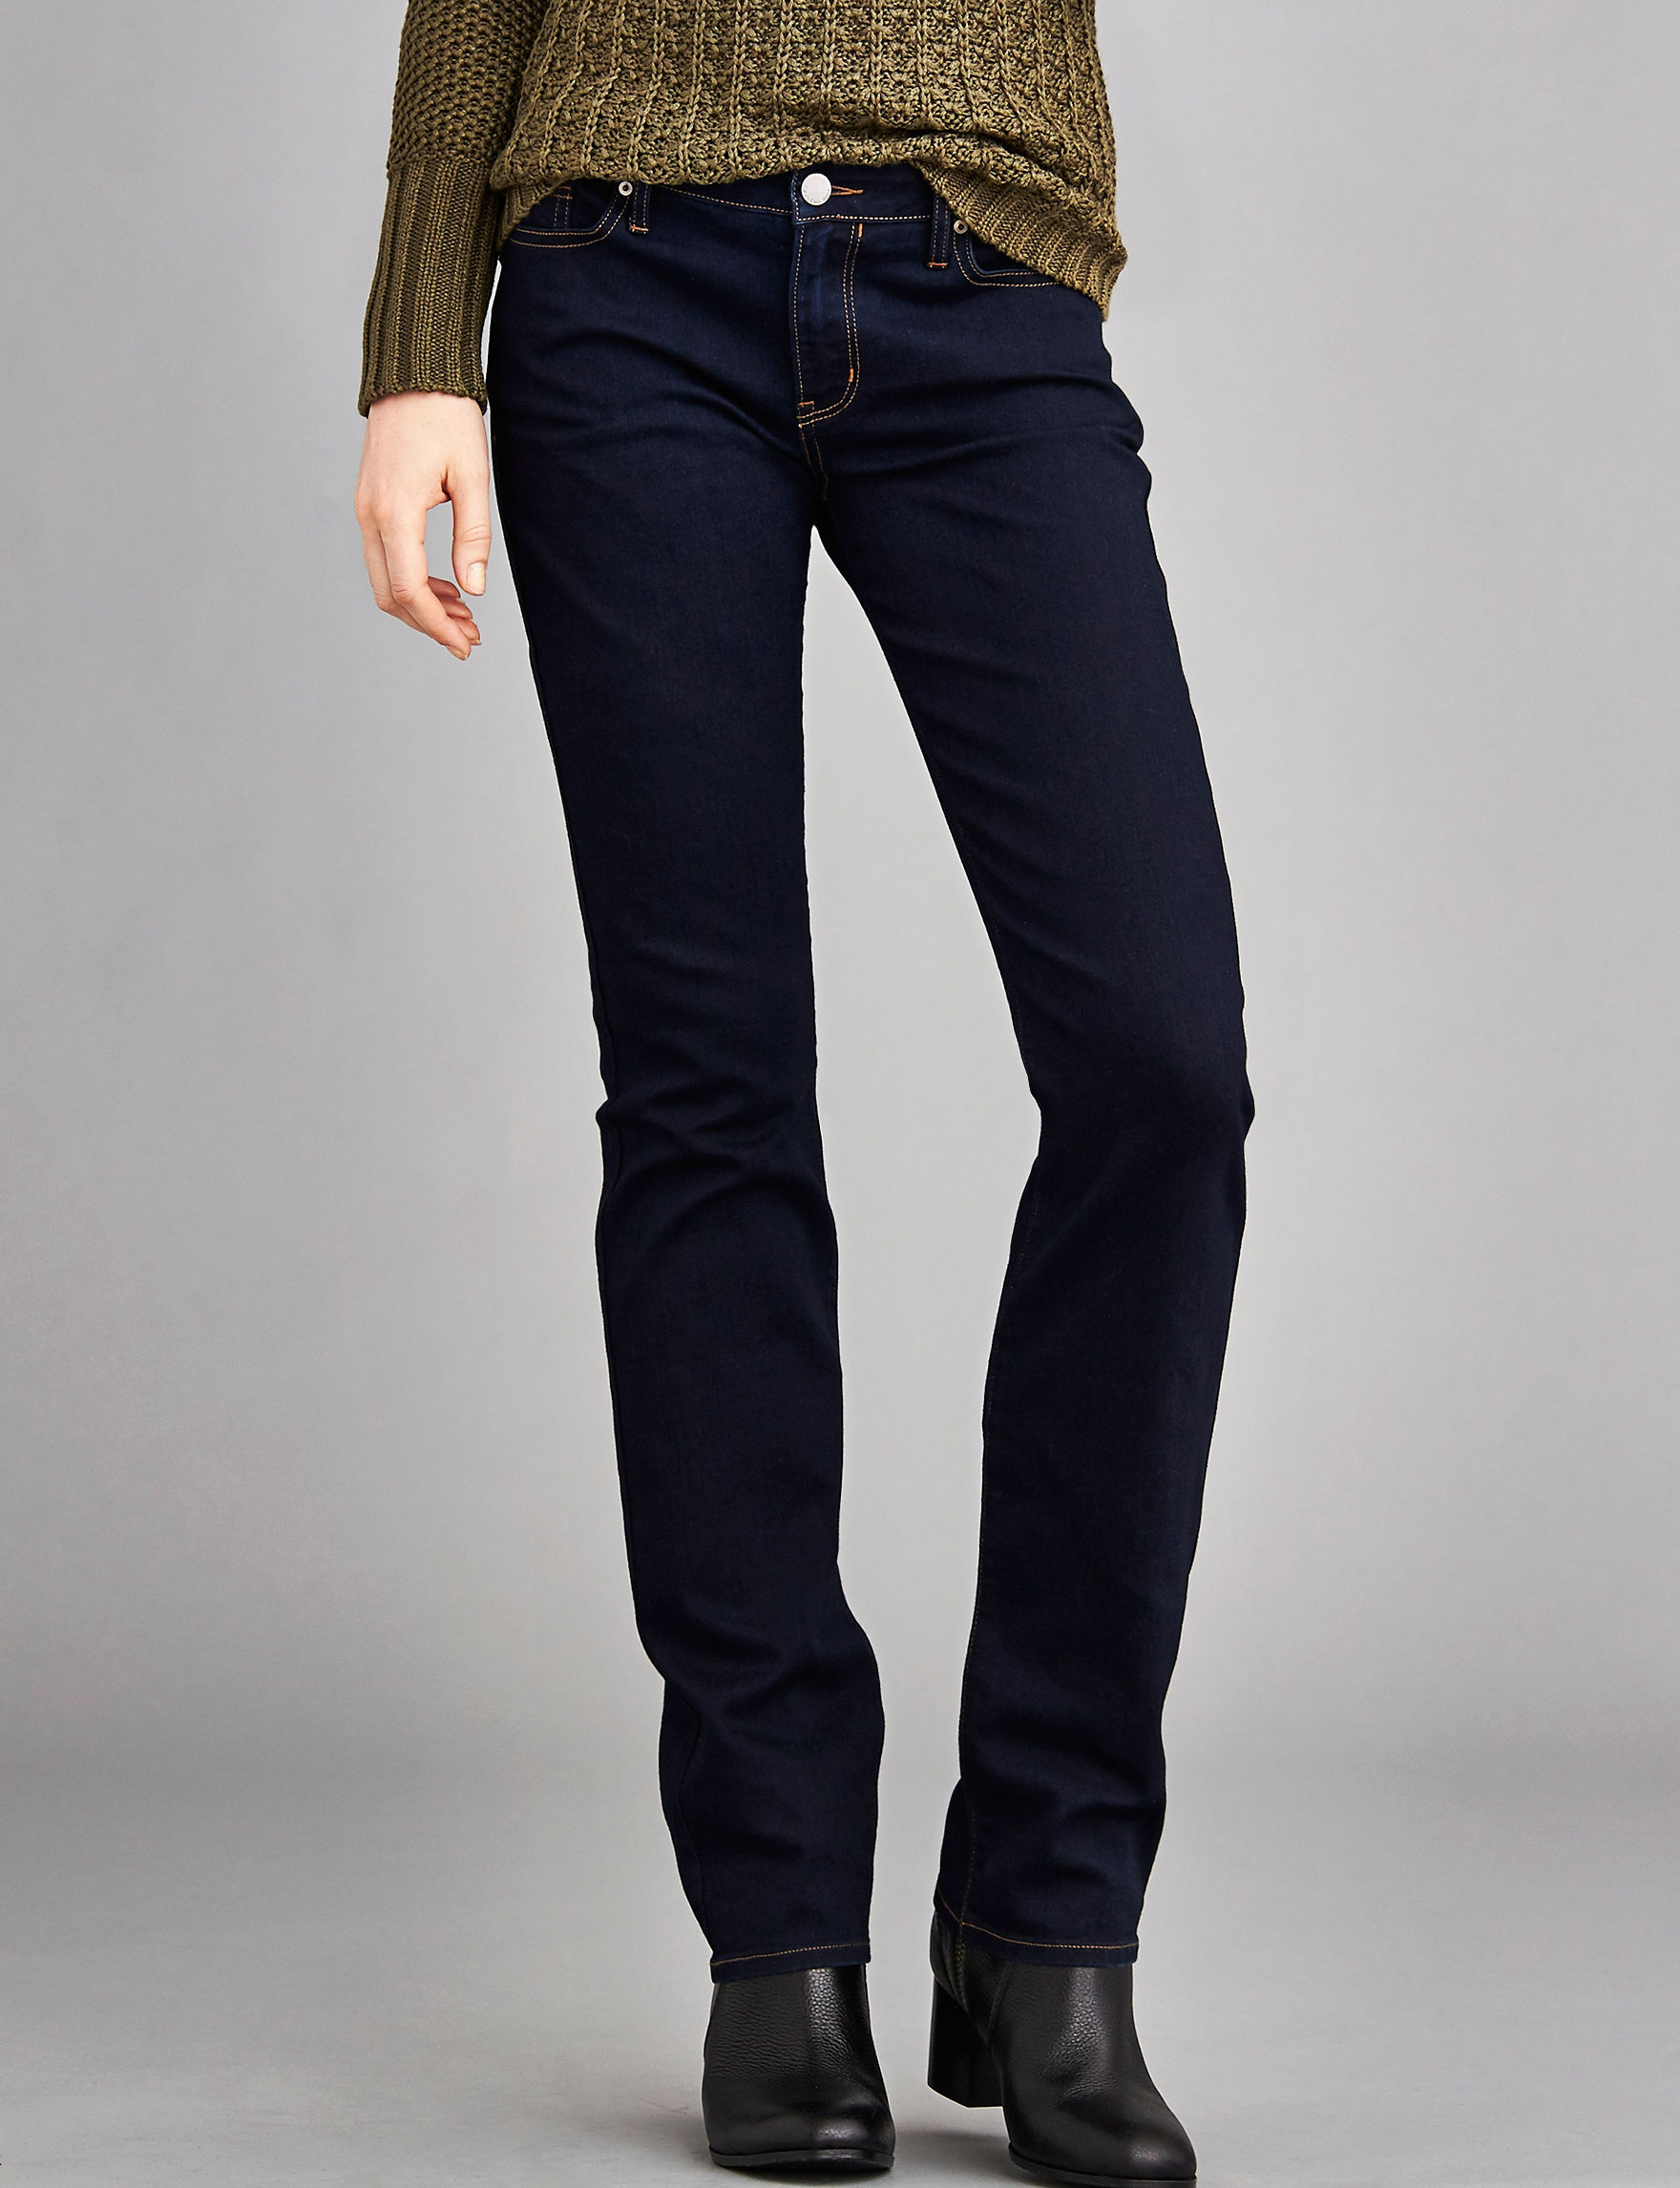 Calvin Klein Jeans Dark Rinse Skinny